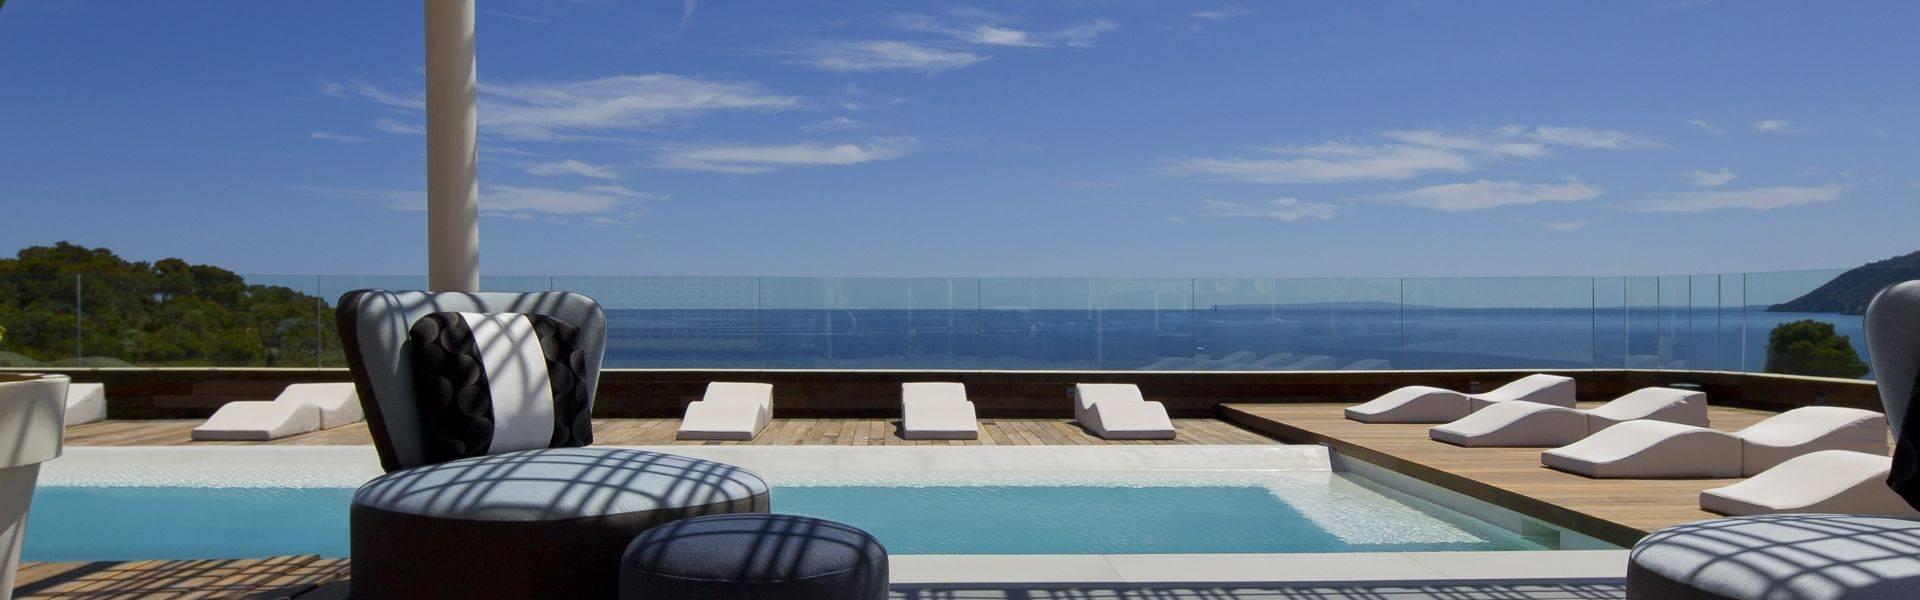 Aguas De Ibiza Rooftop Pool